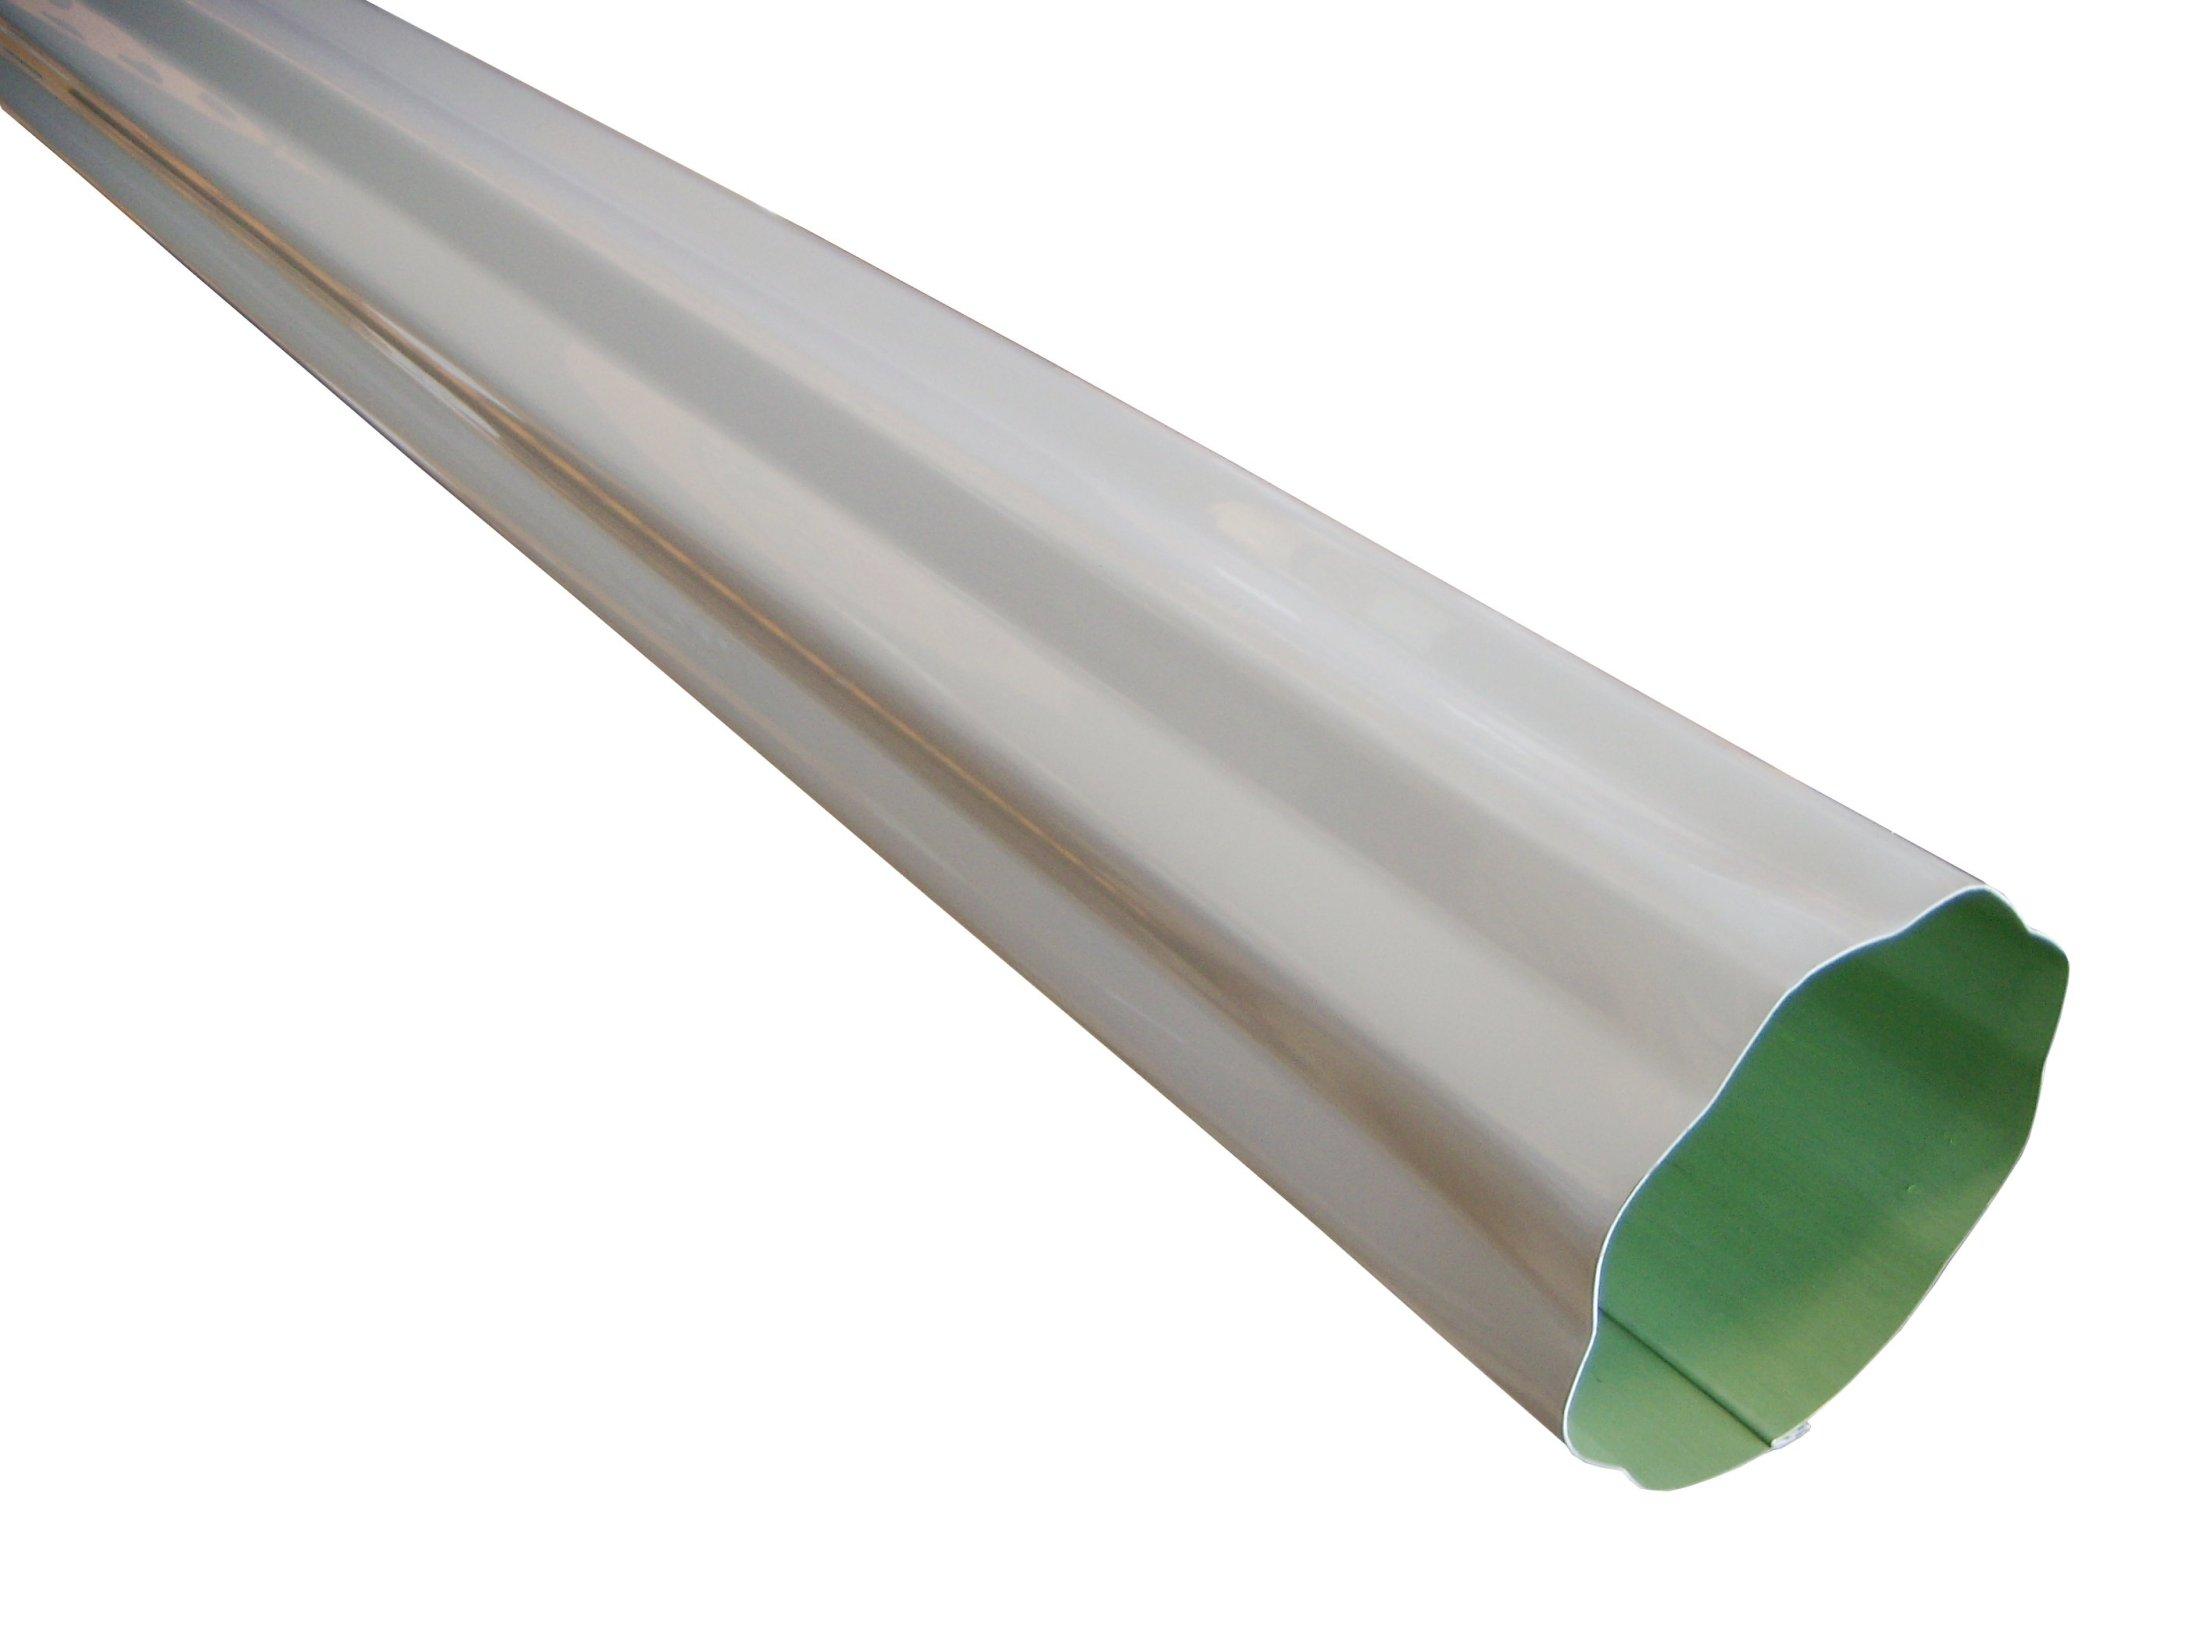 Corrugated Aluminum Downspout